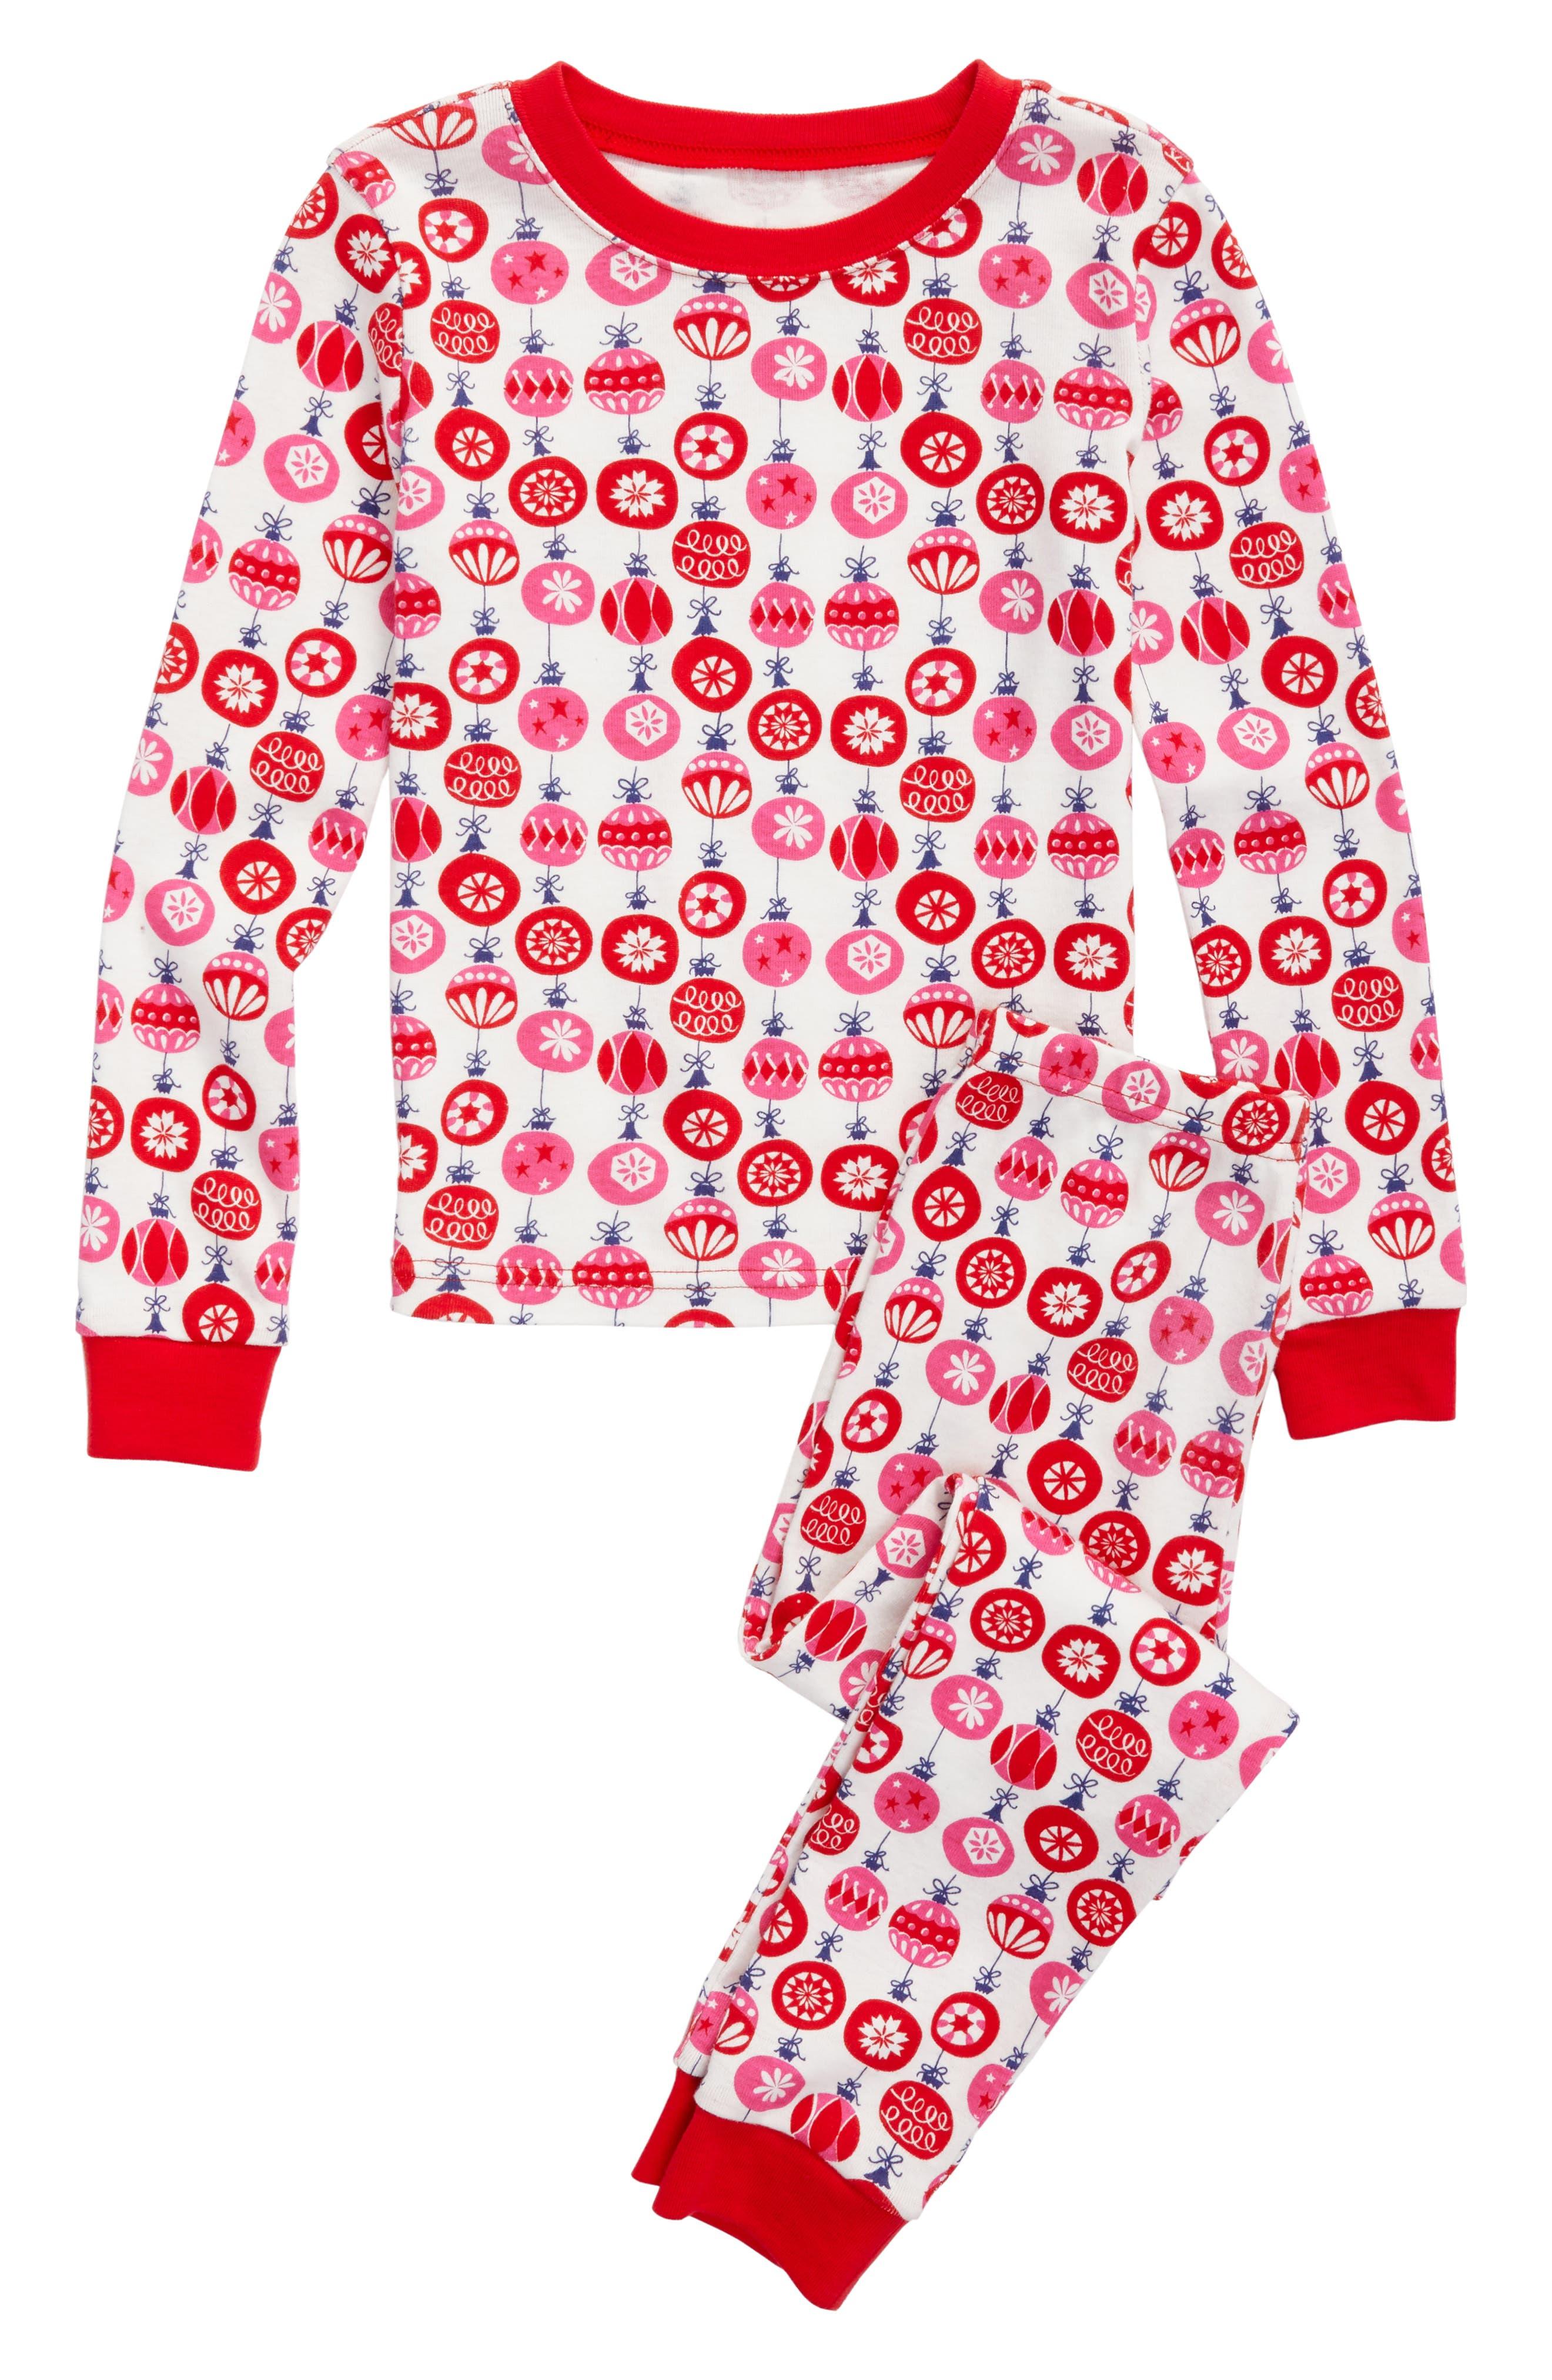 Main Image - Tucker + Tate Fitted Two-Piece Pajamas (Toddler Girls, Little Girls & Big Girls)